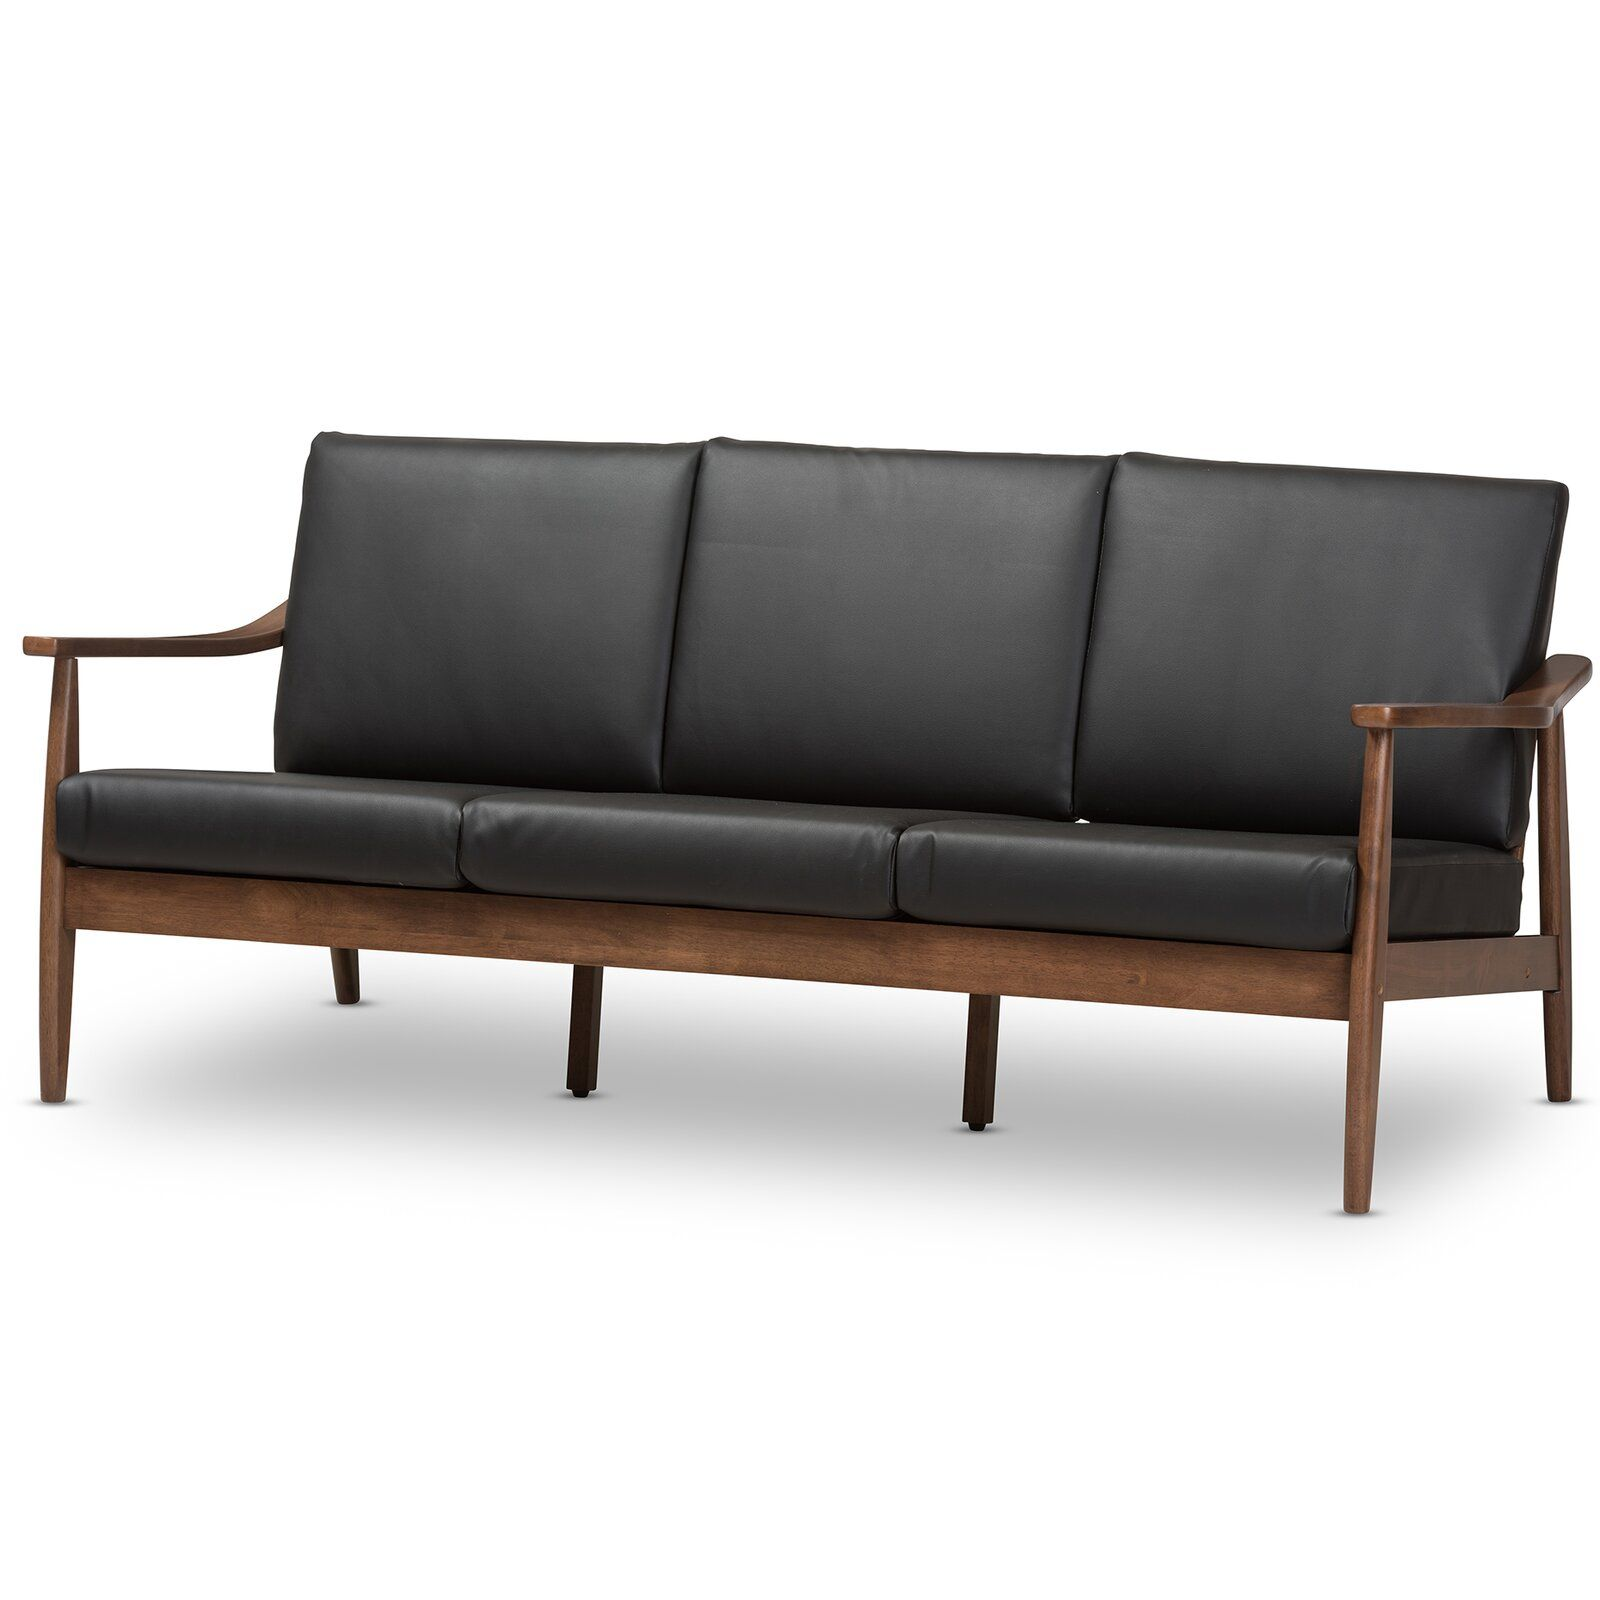 leaman midcentury modern faux sofa  faux leather sofa 3